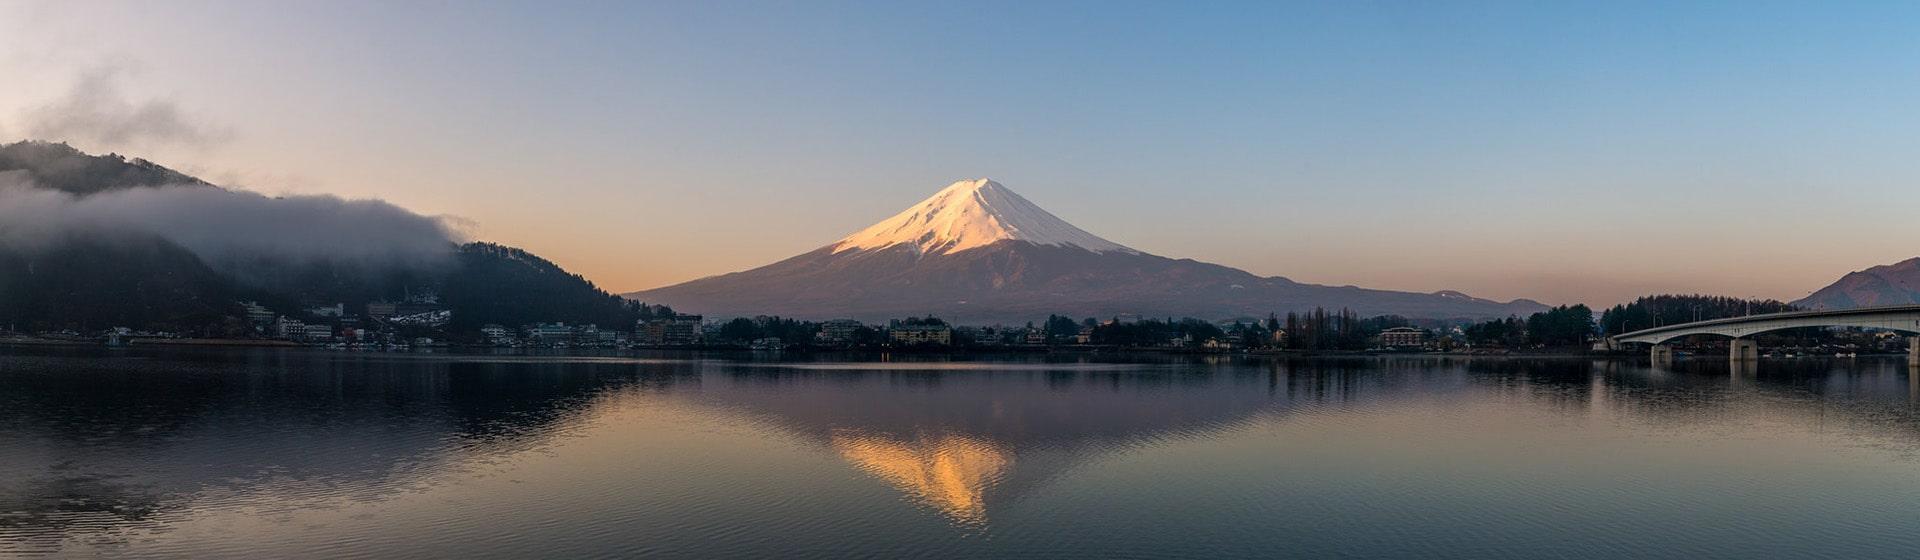 Город эпохи Эдо<br> Токио – Одайба – Никко – Кинугава – Токио